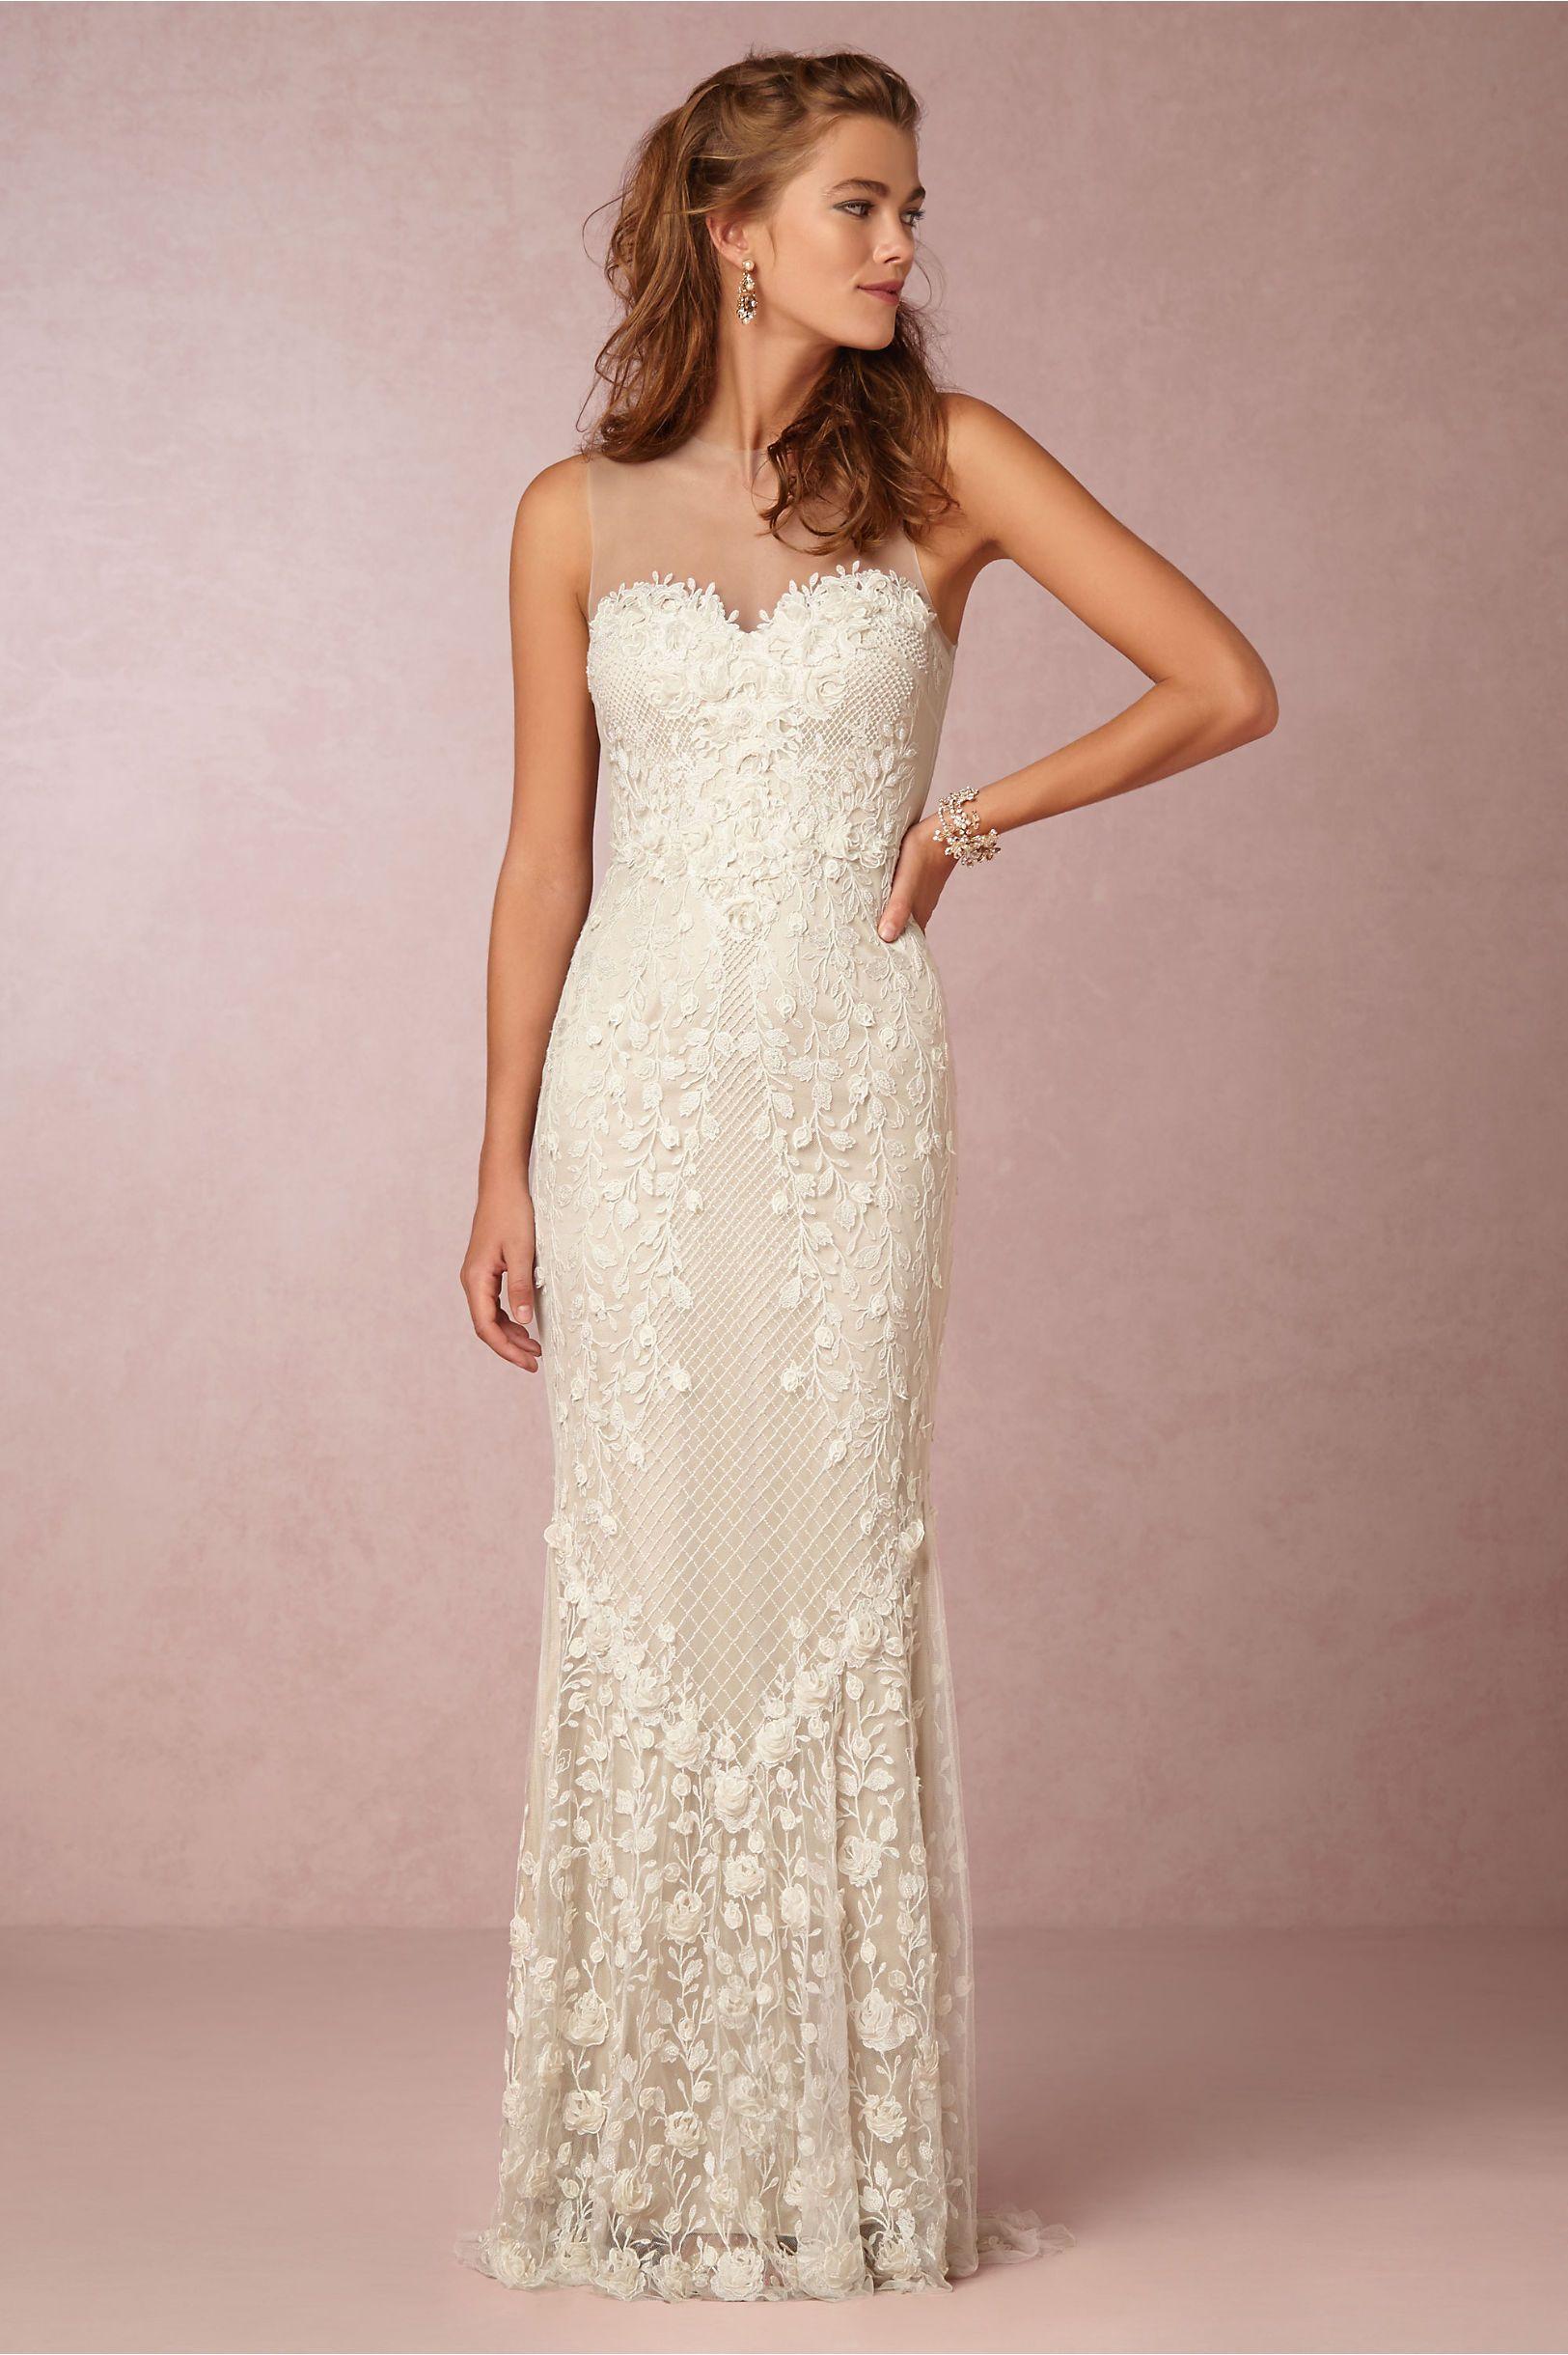 Silhouette wedding dresses simple bridal  Ashton Gown in Bride Wedding Dresses at BHLDN  Wedding  Pinterest